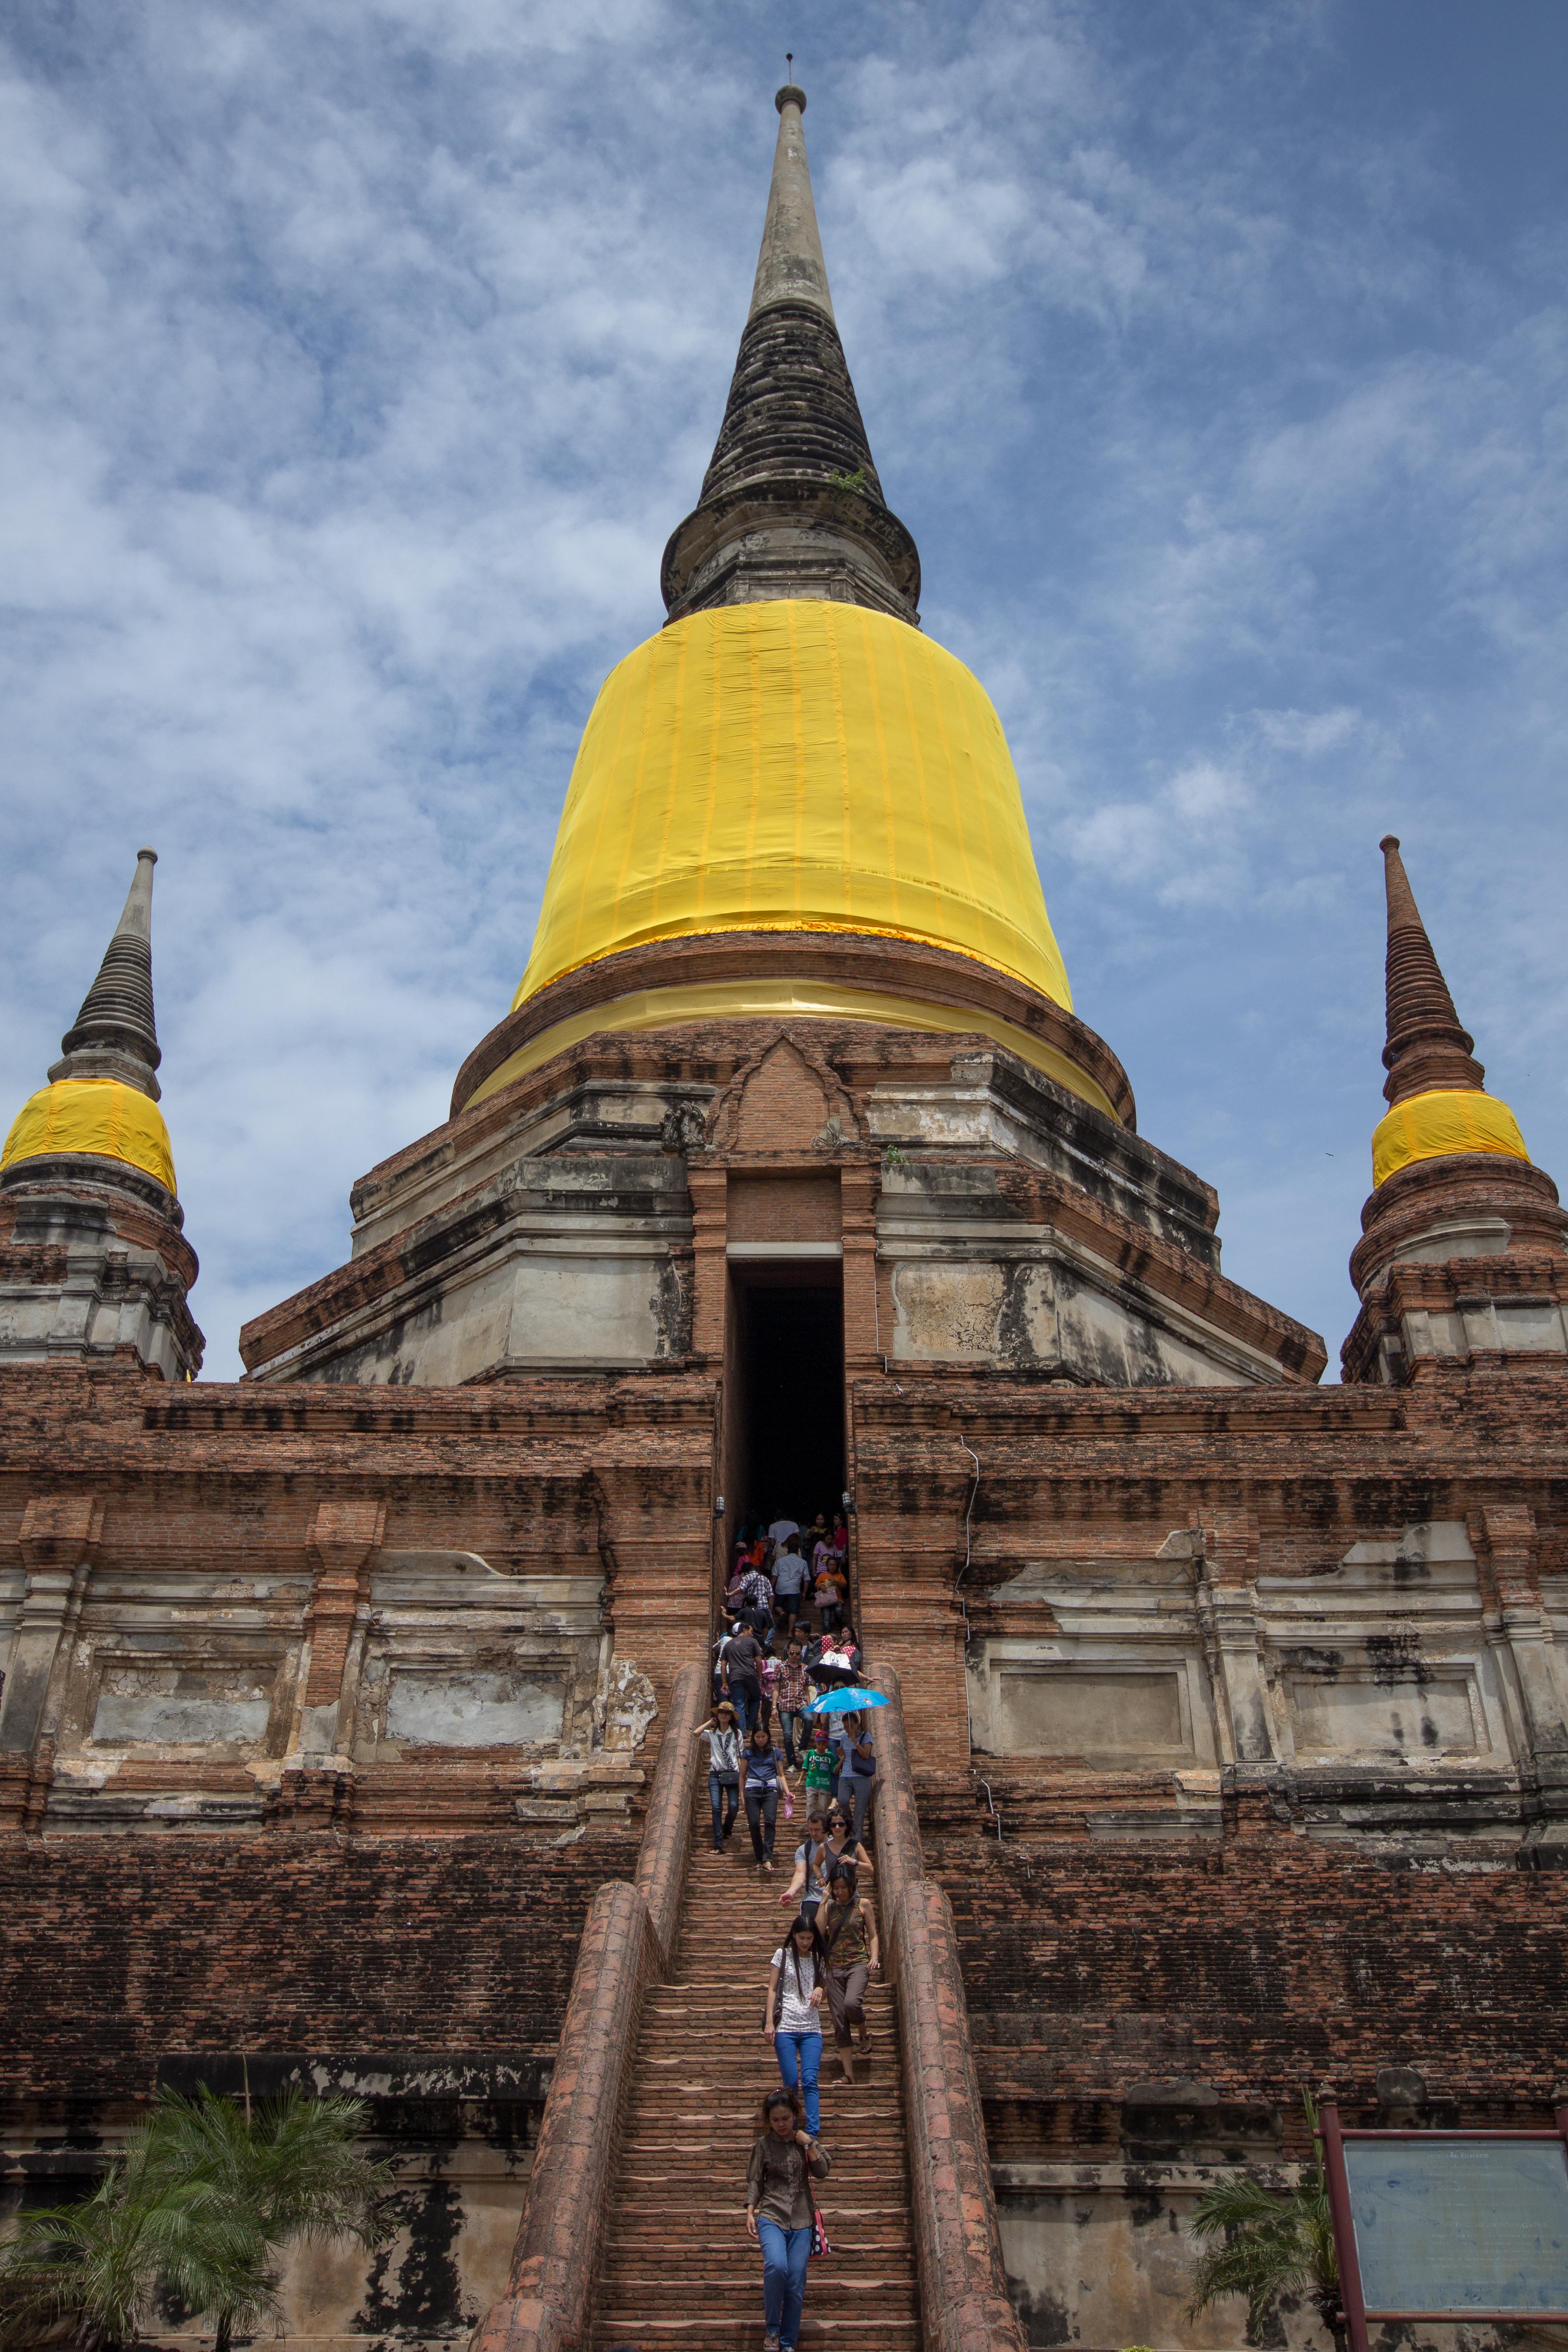 File:Wat Yai Chai Mongkol-2.jpg